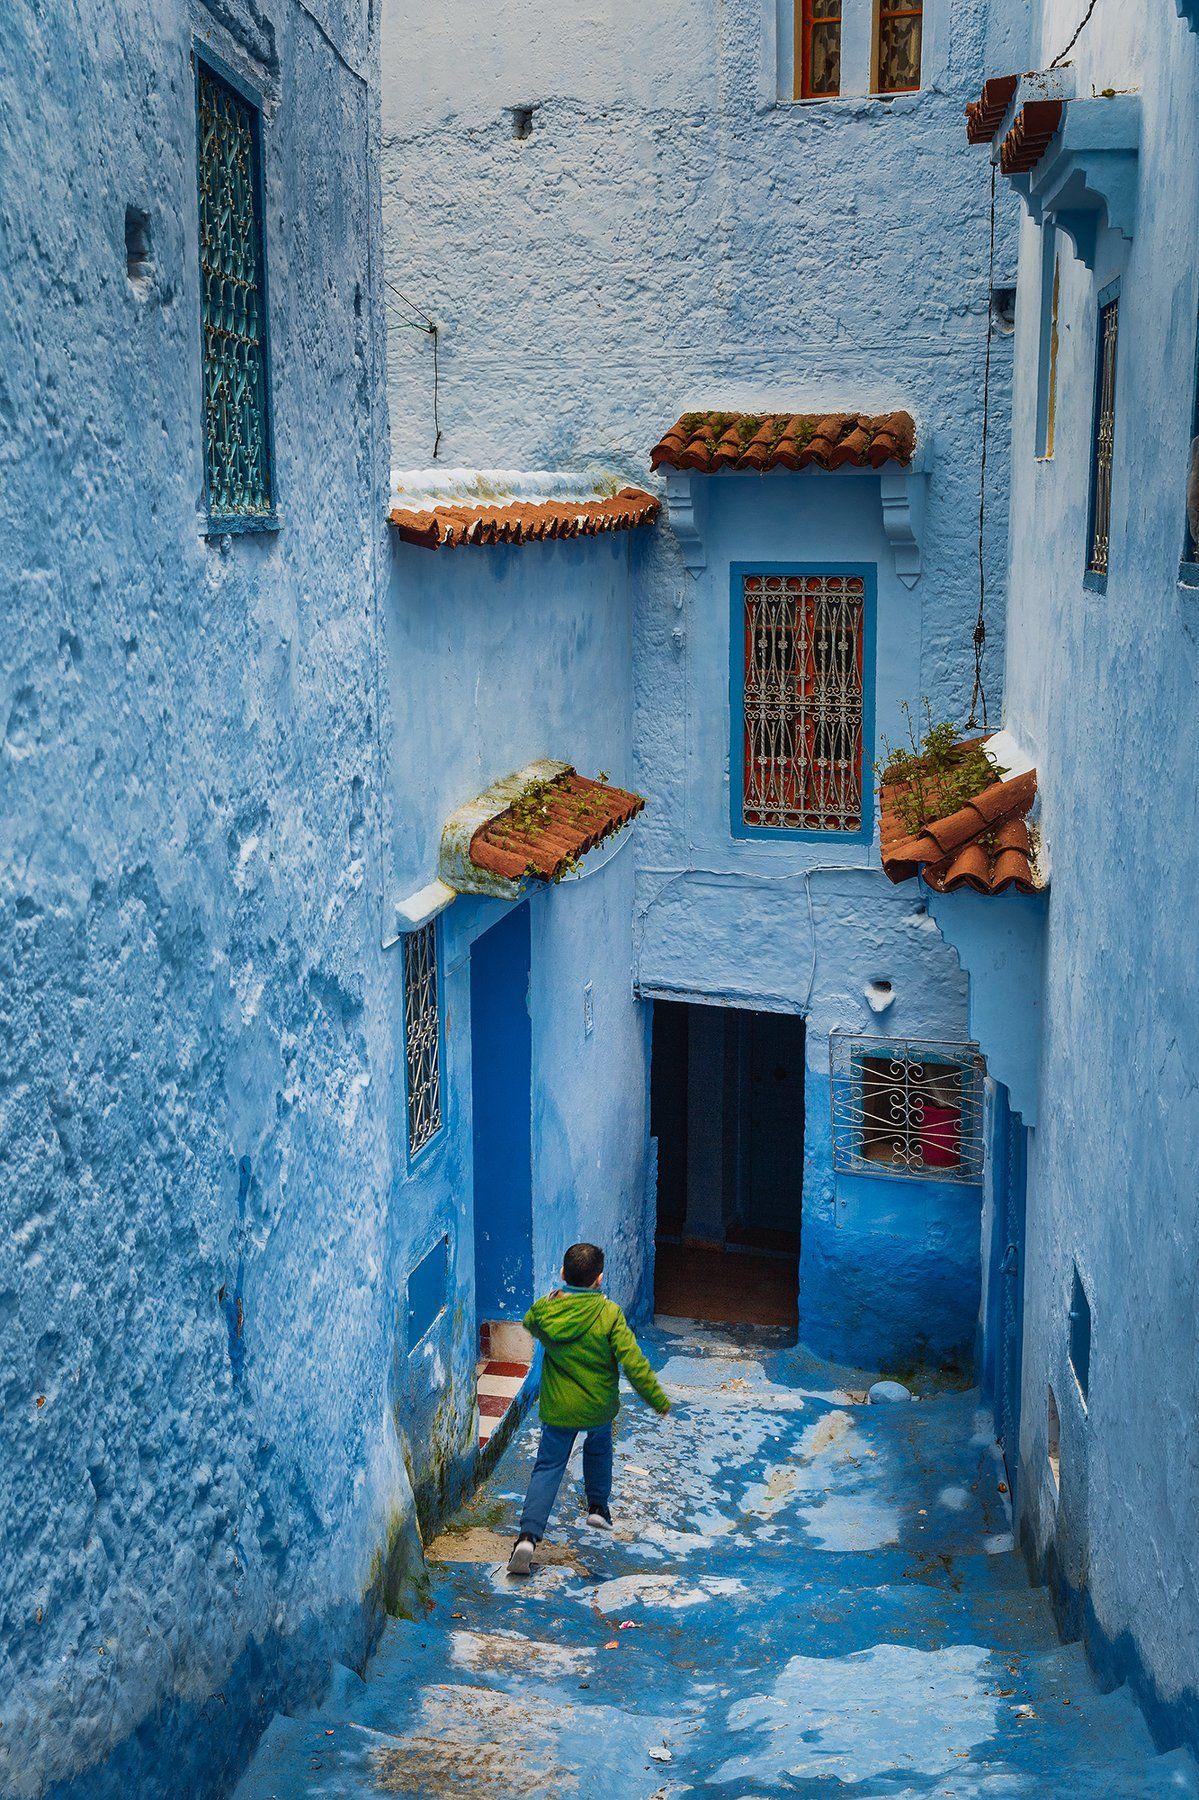 марокко, путешествие, архитектура, репортаж, африка, Анастасия Колесникова